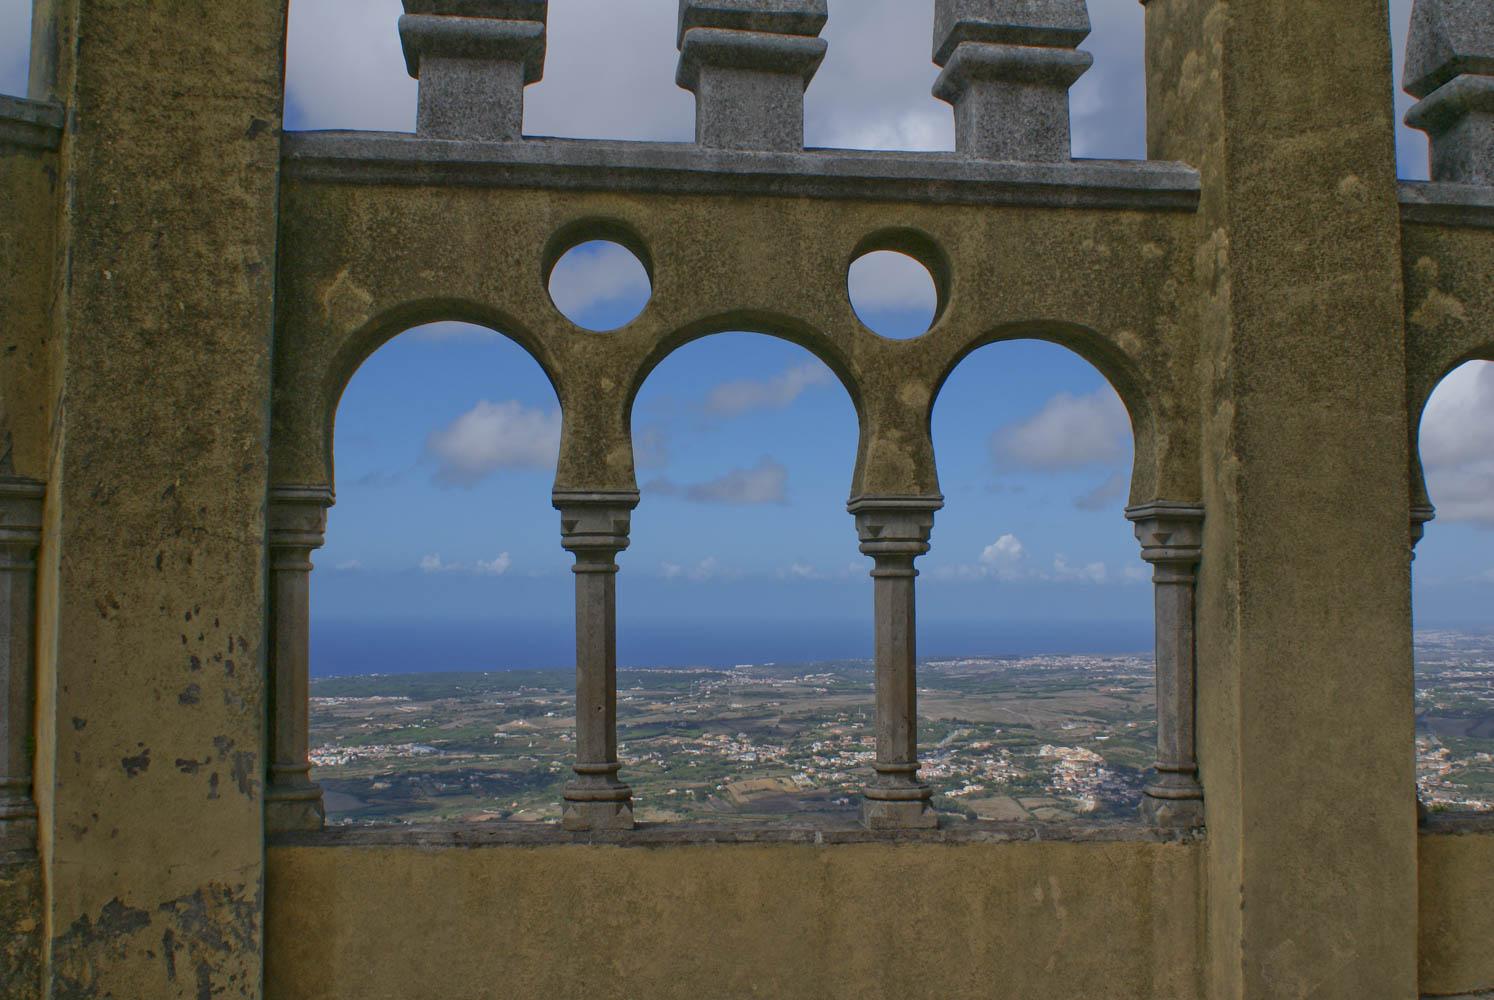 The castle overlooks the Atlantic